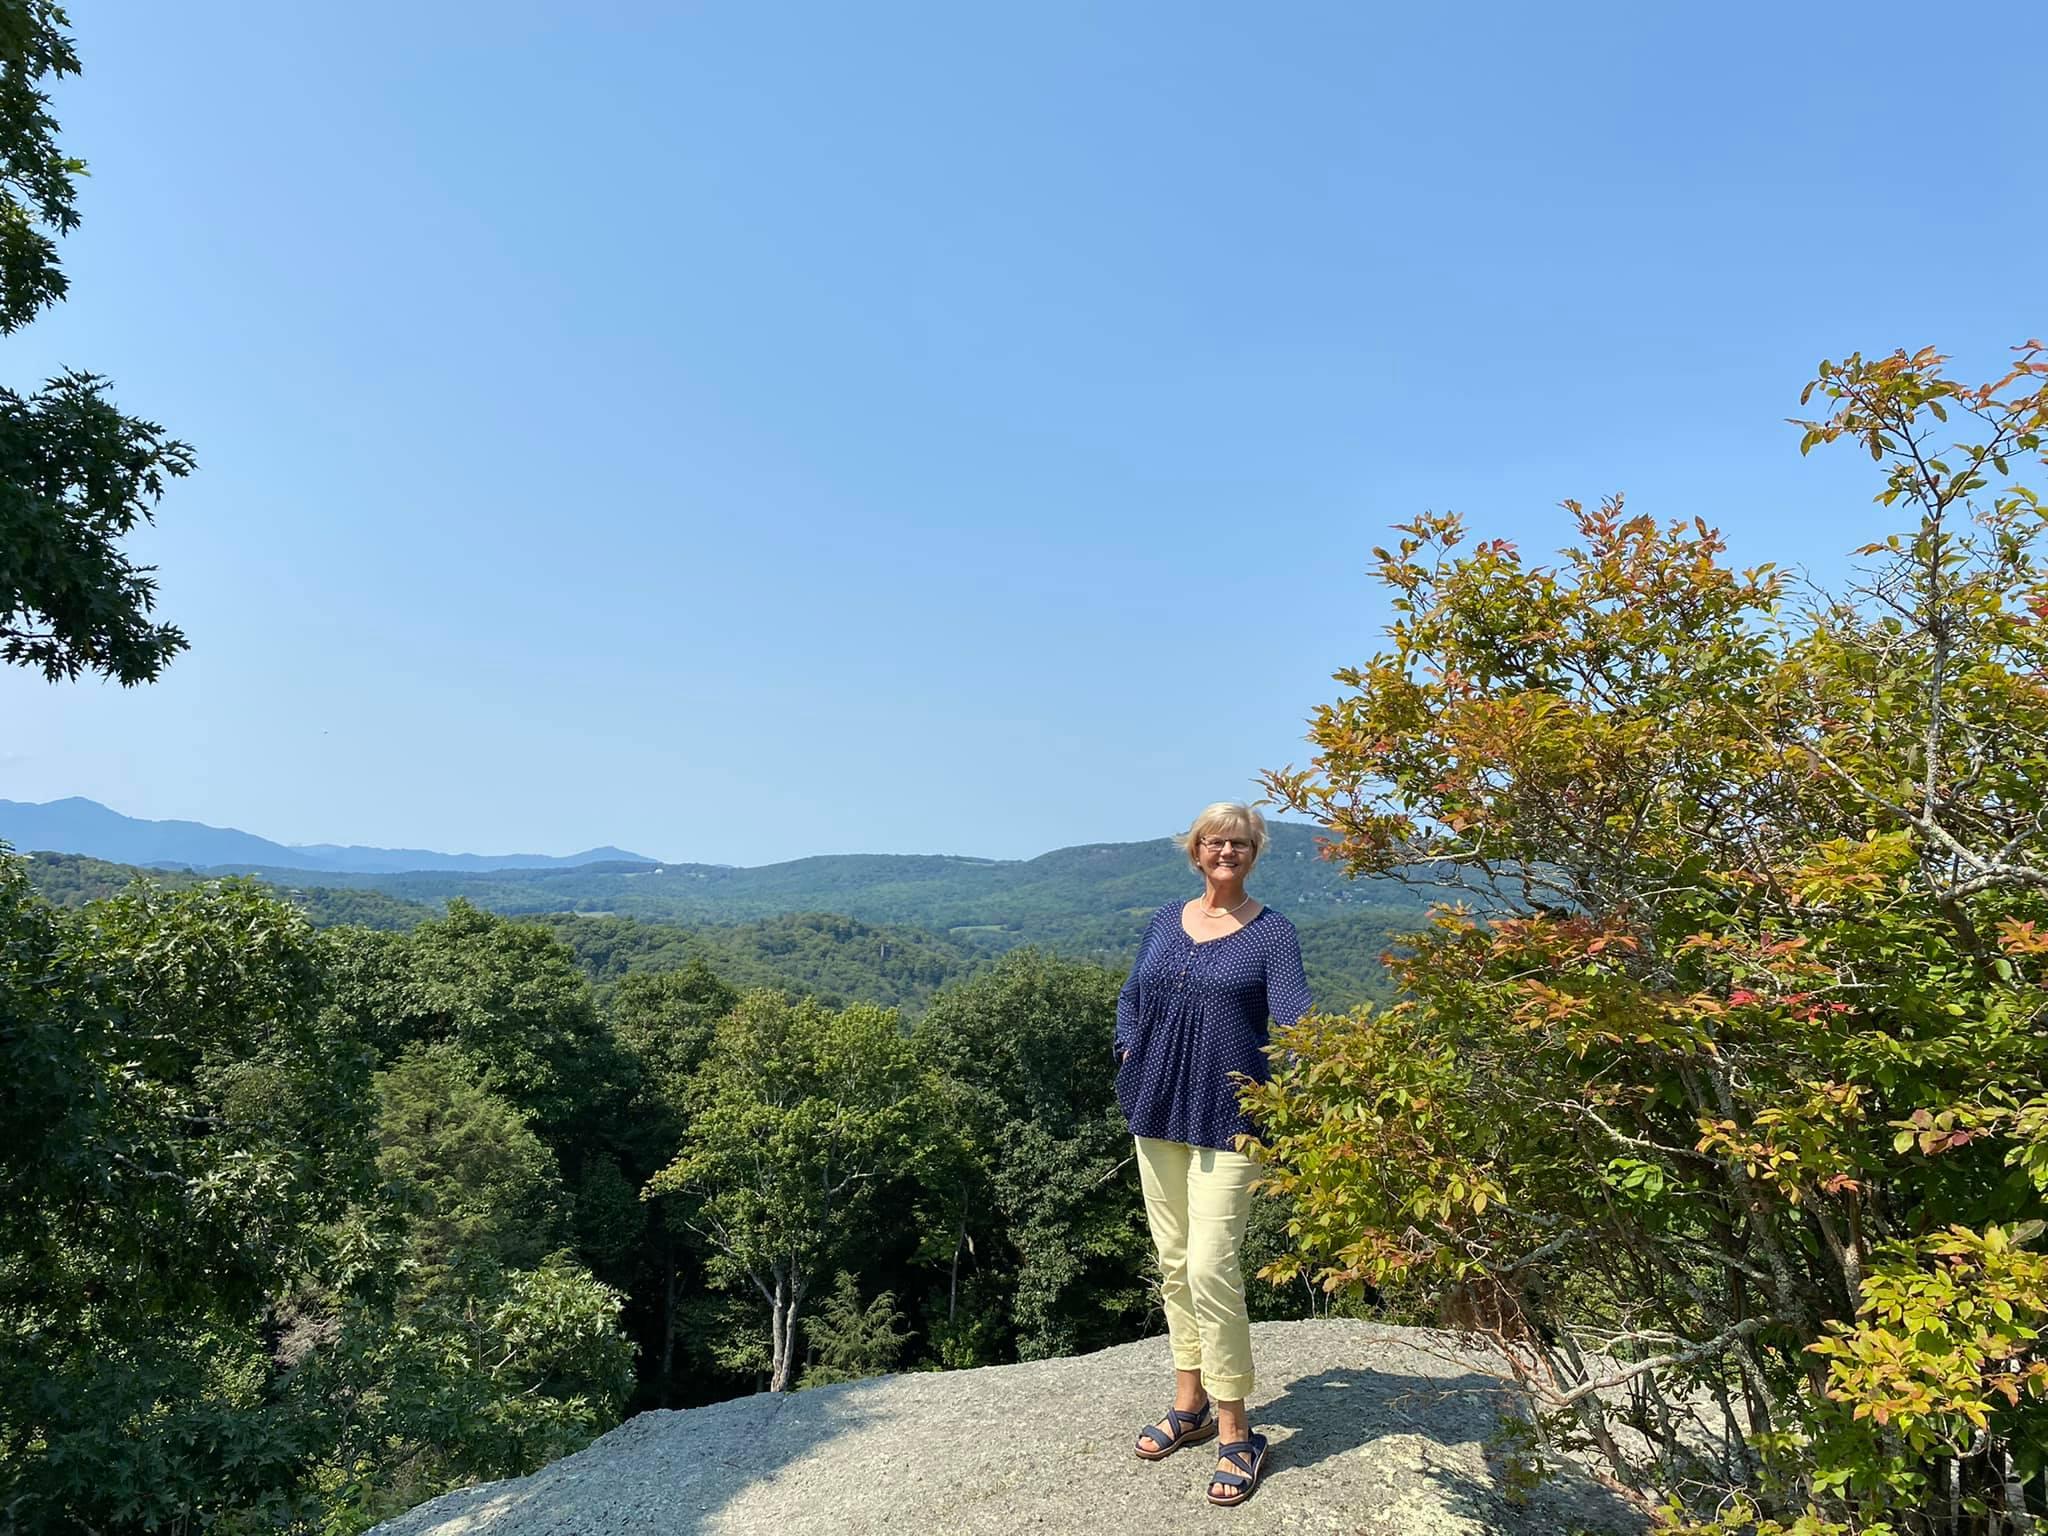 Raven Rocks Overlook- Ingrid Lemme photo